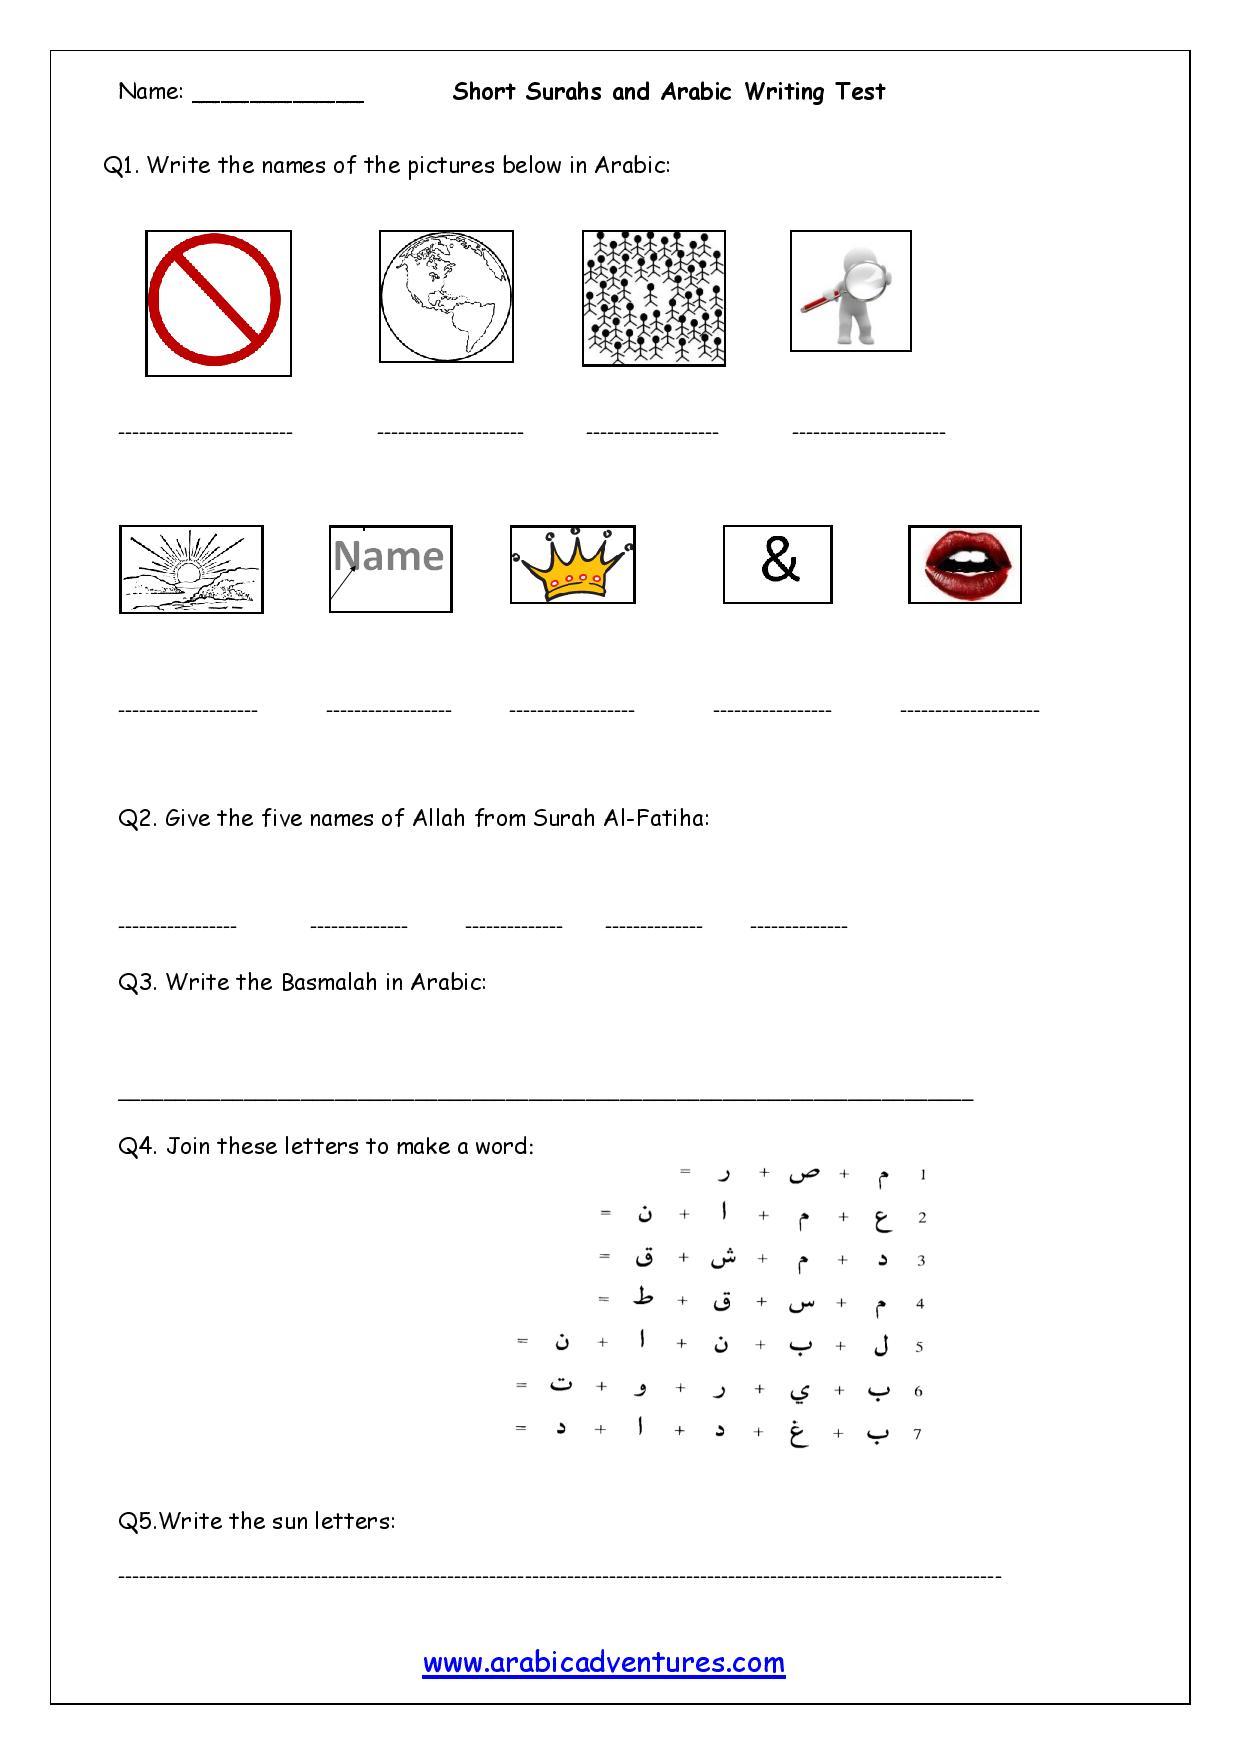 arabic worksheet short surahs arabic adventures. Black Bedroom Furniture Sets. Home Design Ideas